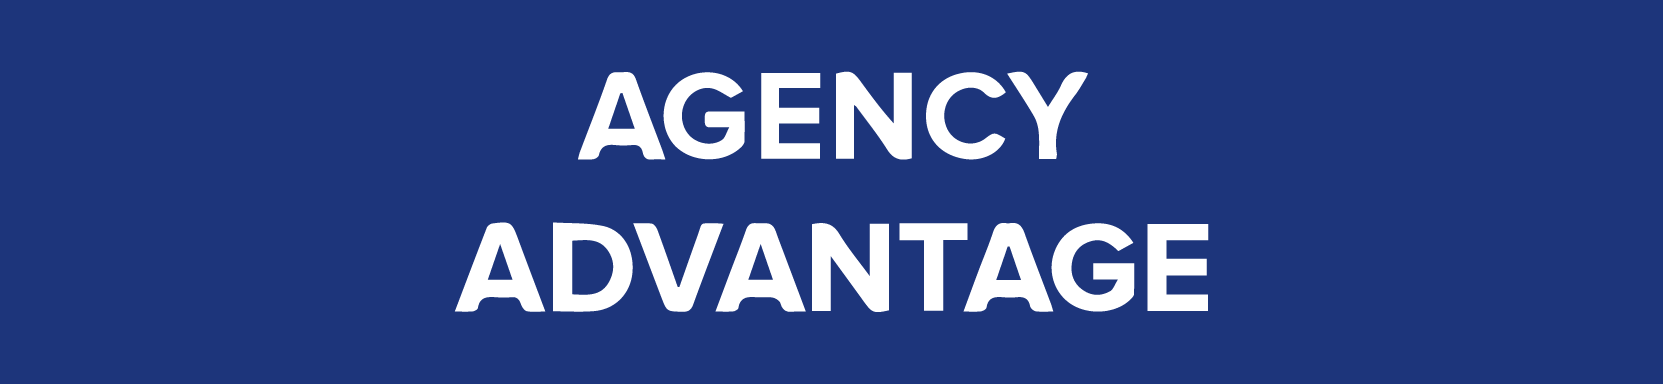 Adengy Advantage Advertising Marketing Podcast